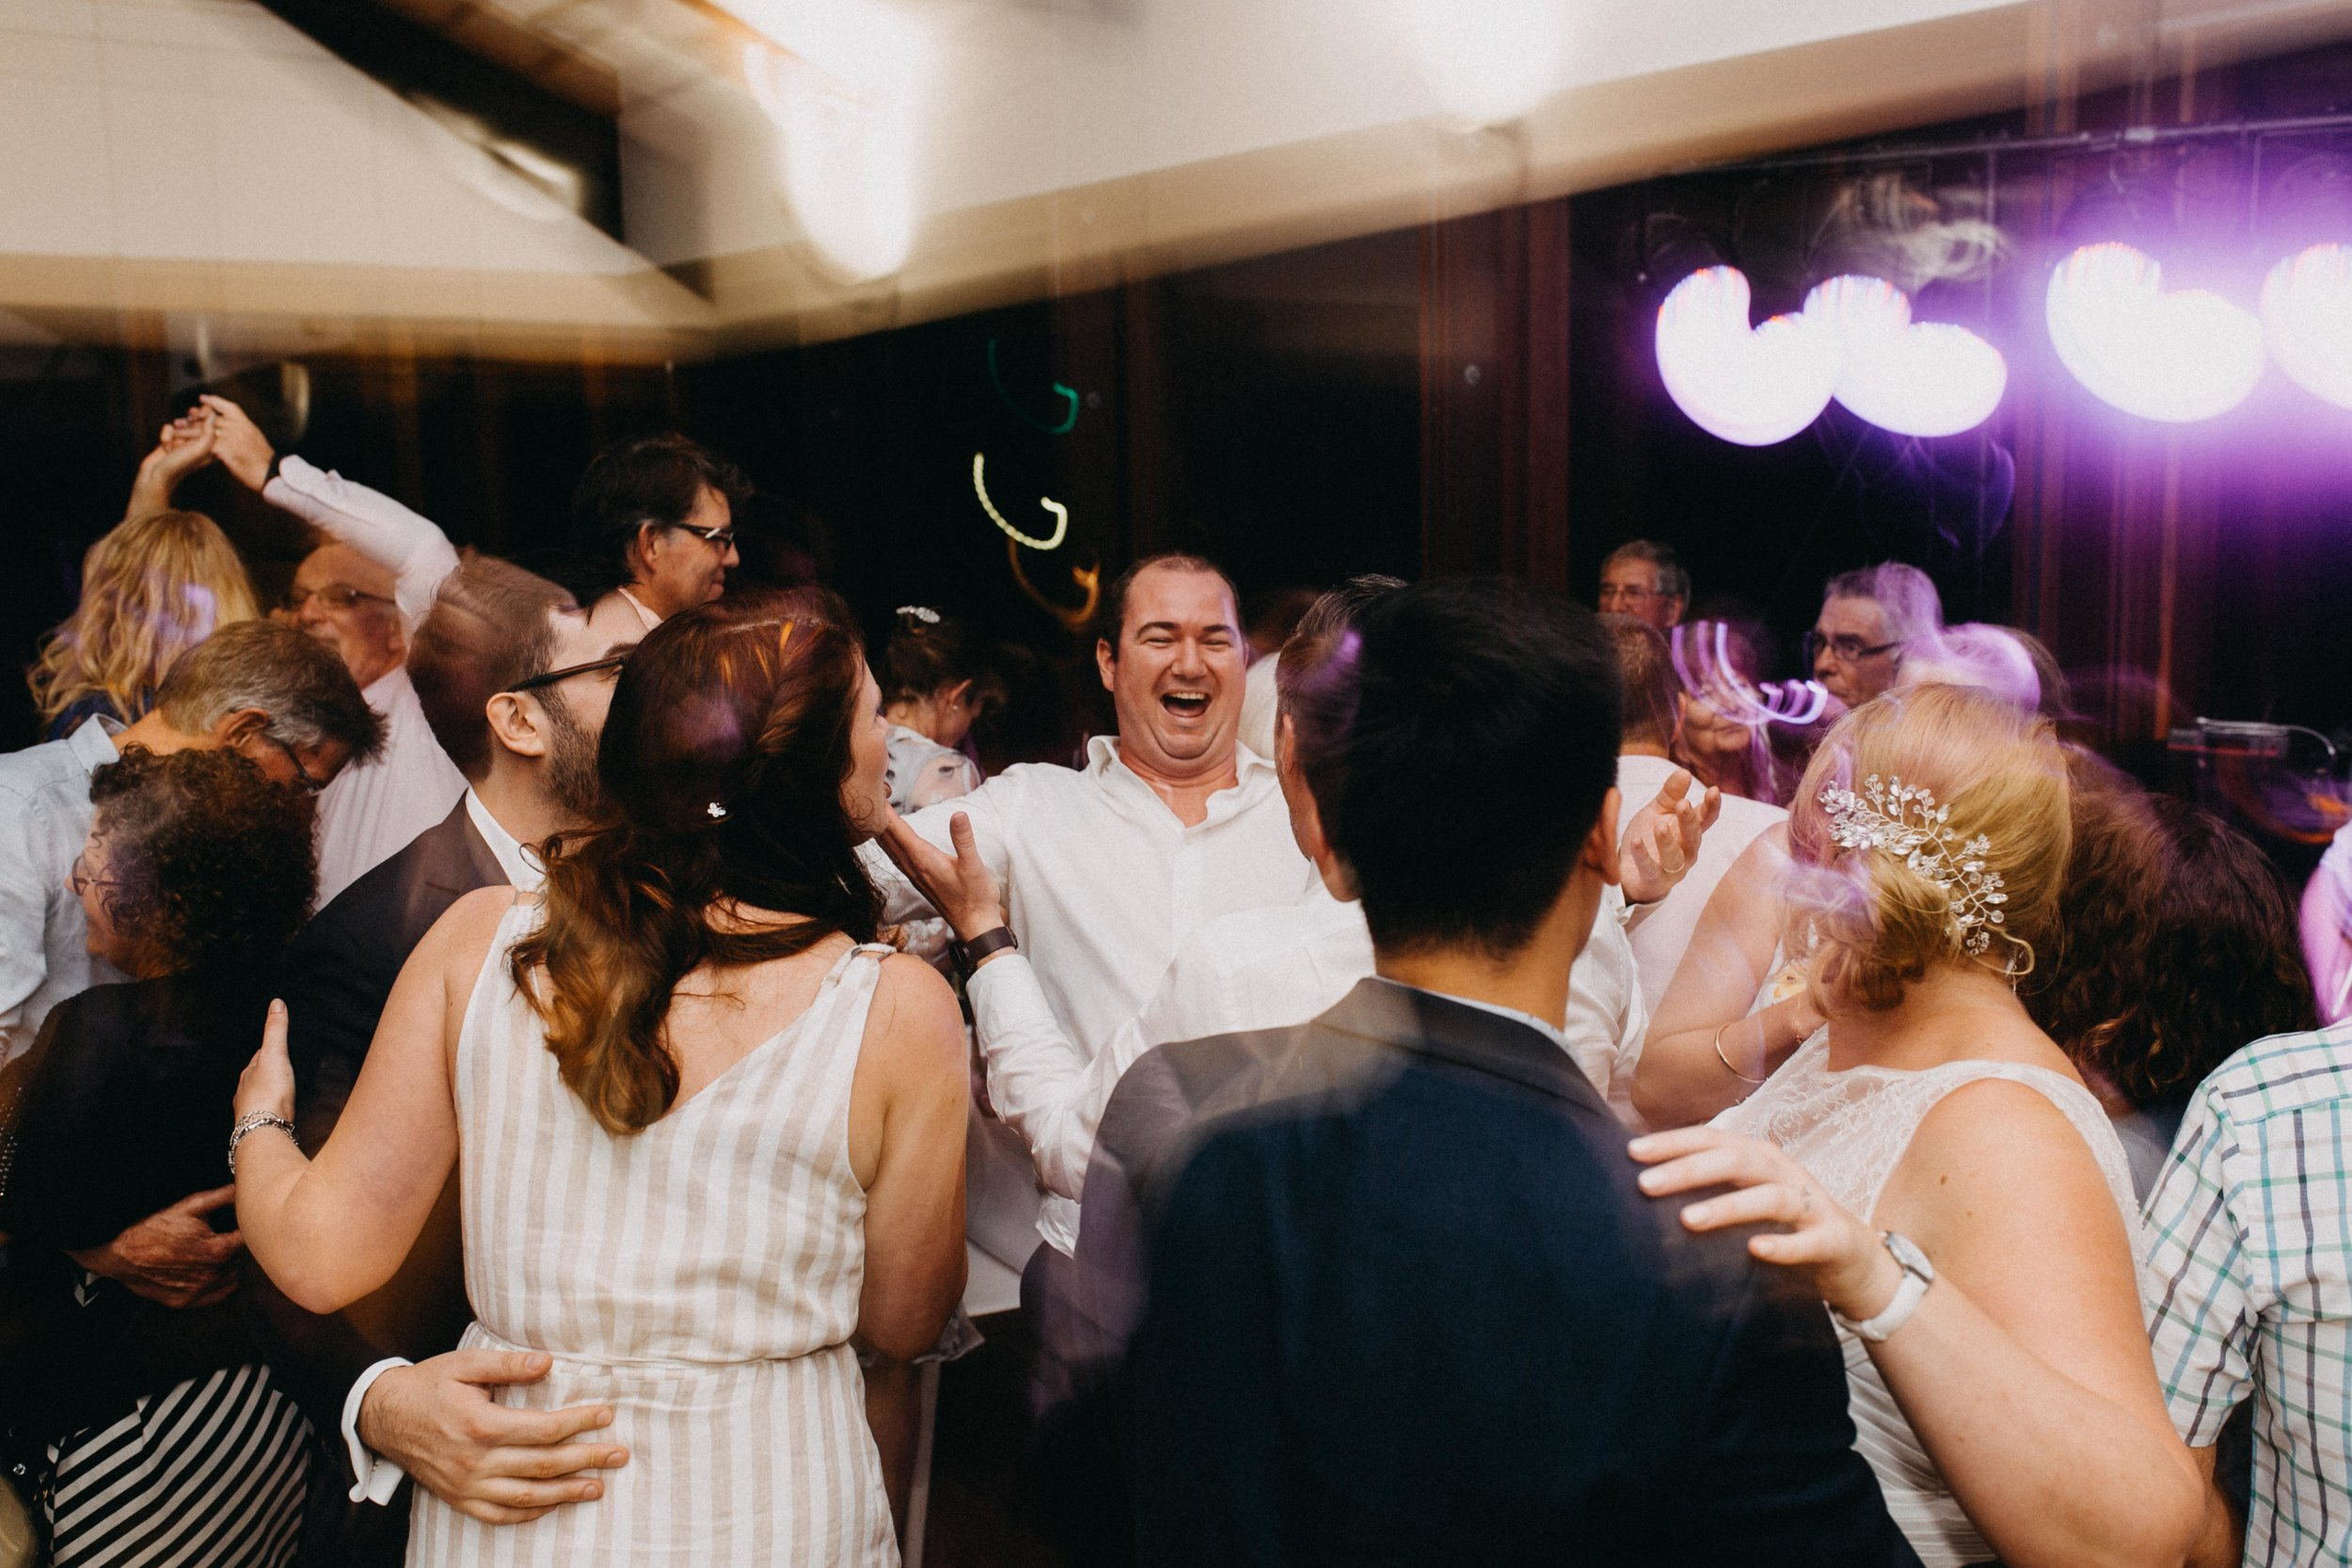 cabarita-park-sydney-wedding-emilyobrienphotography.net-93.jpg